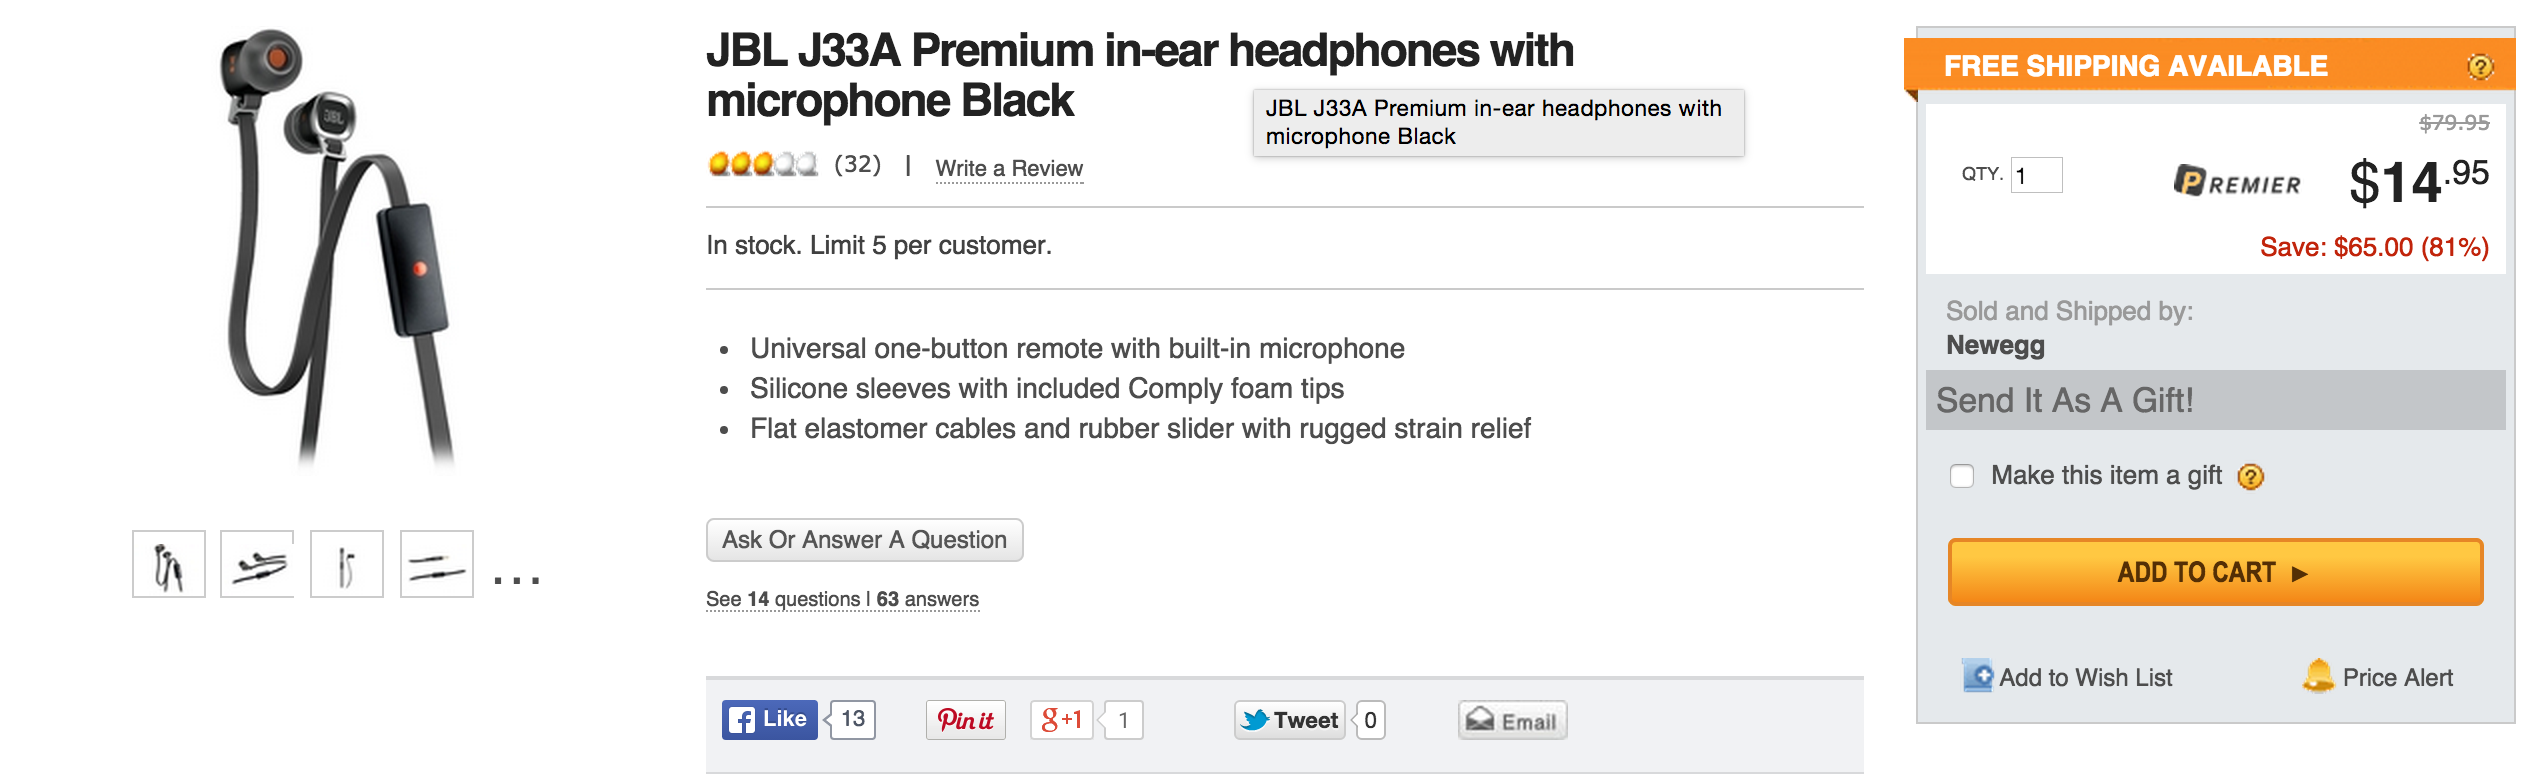 Apple headphones wireless with microphone - jbl wireless earbuds with microphone